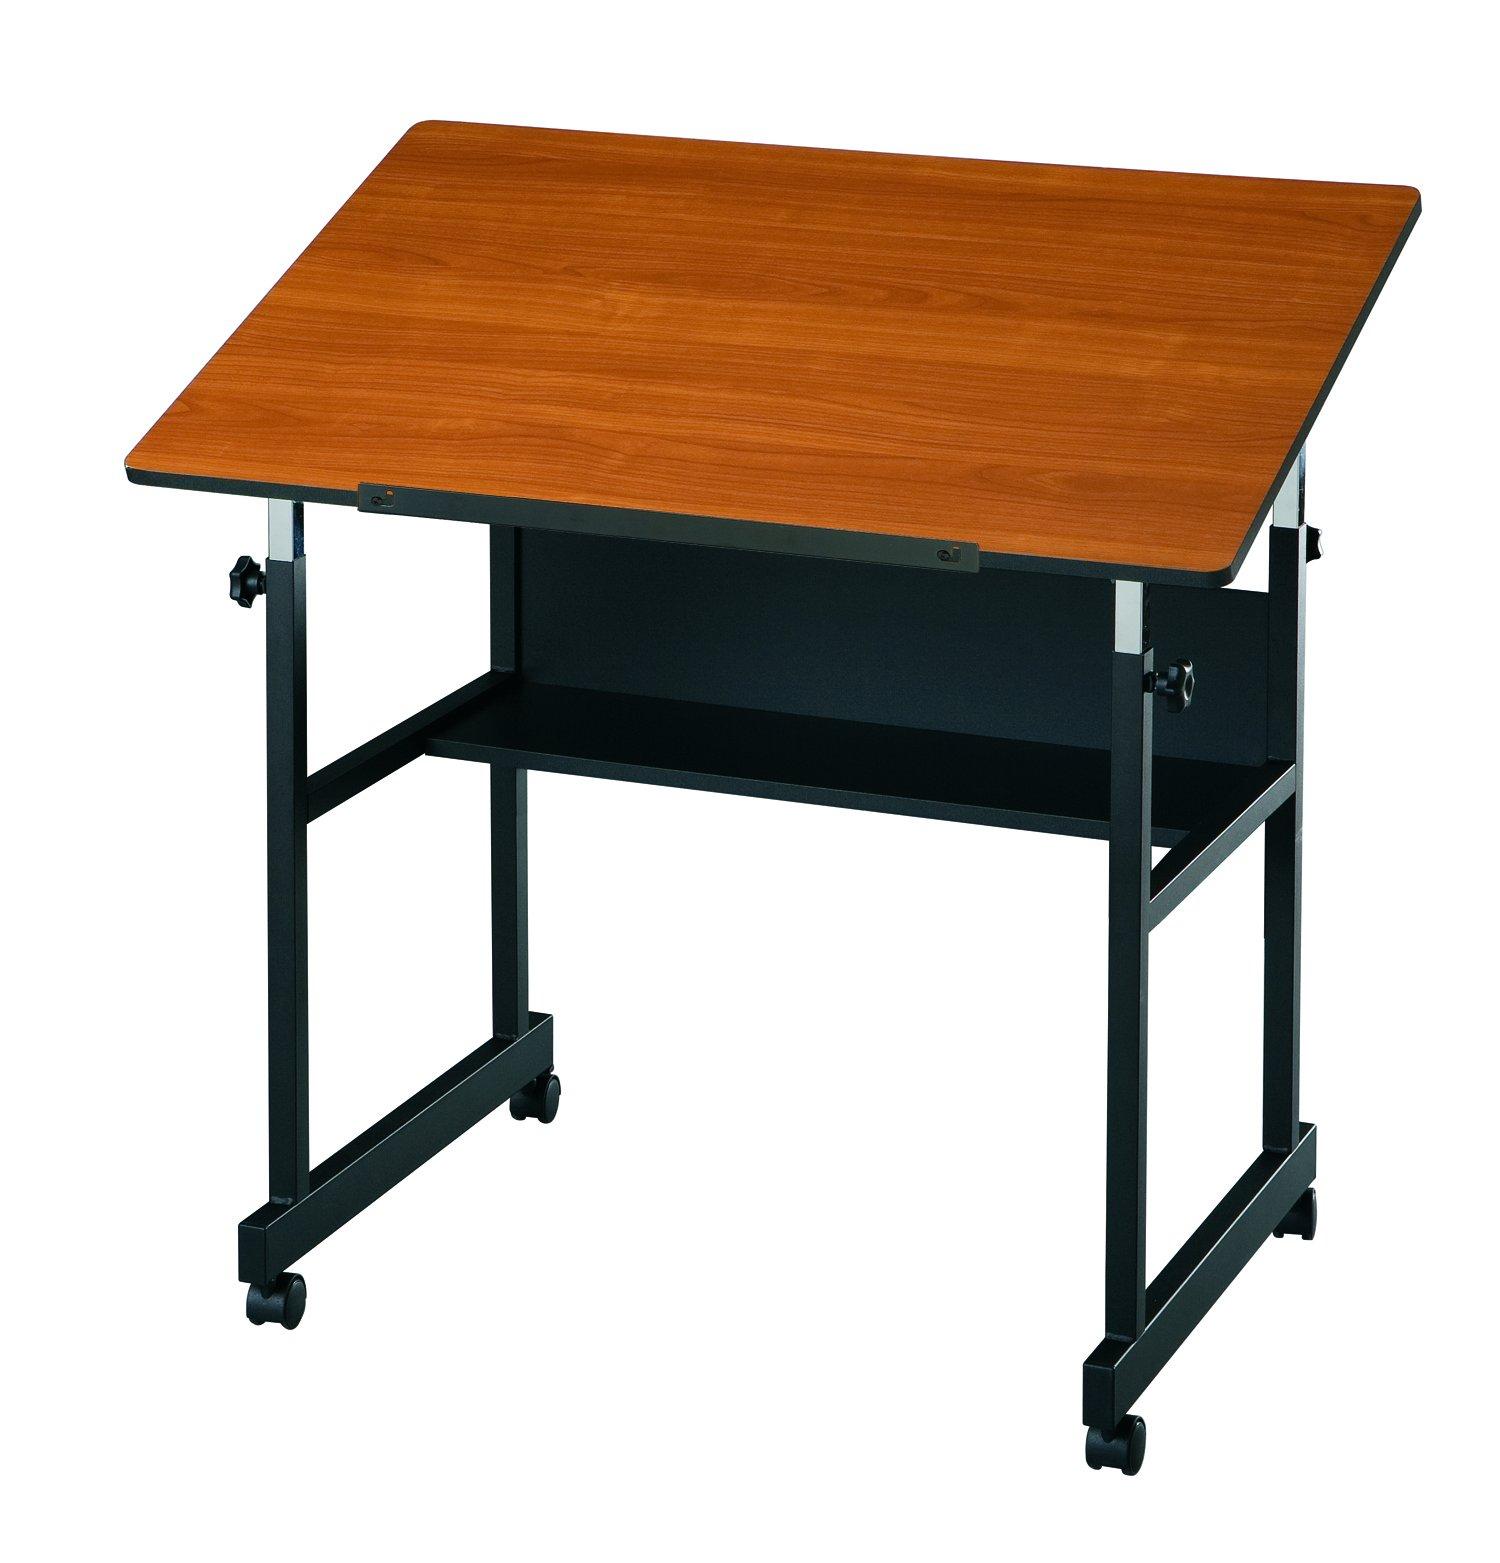 Alvin MM36-3-WBR MiniMaster Table Black Base with Woodgrain Top